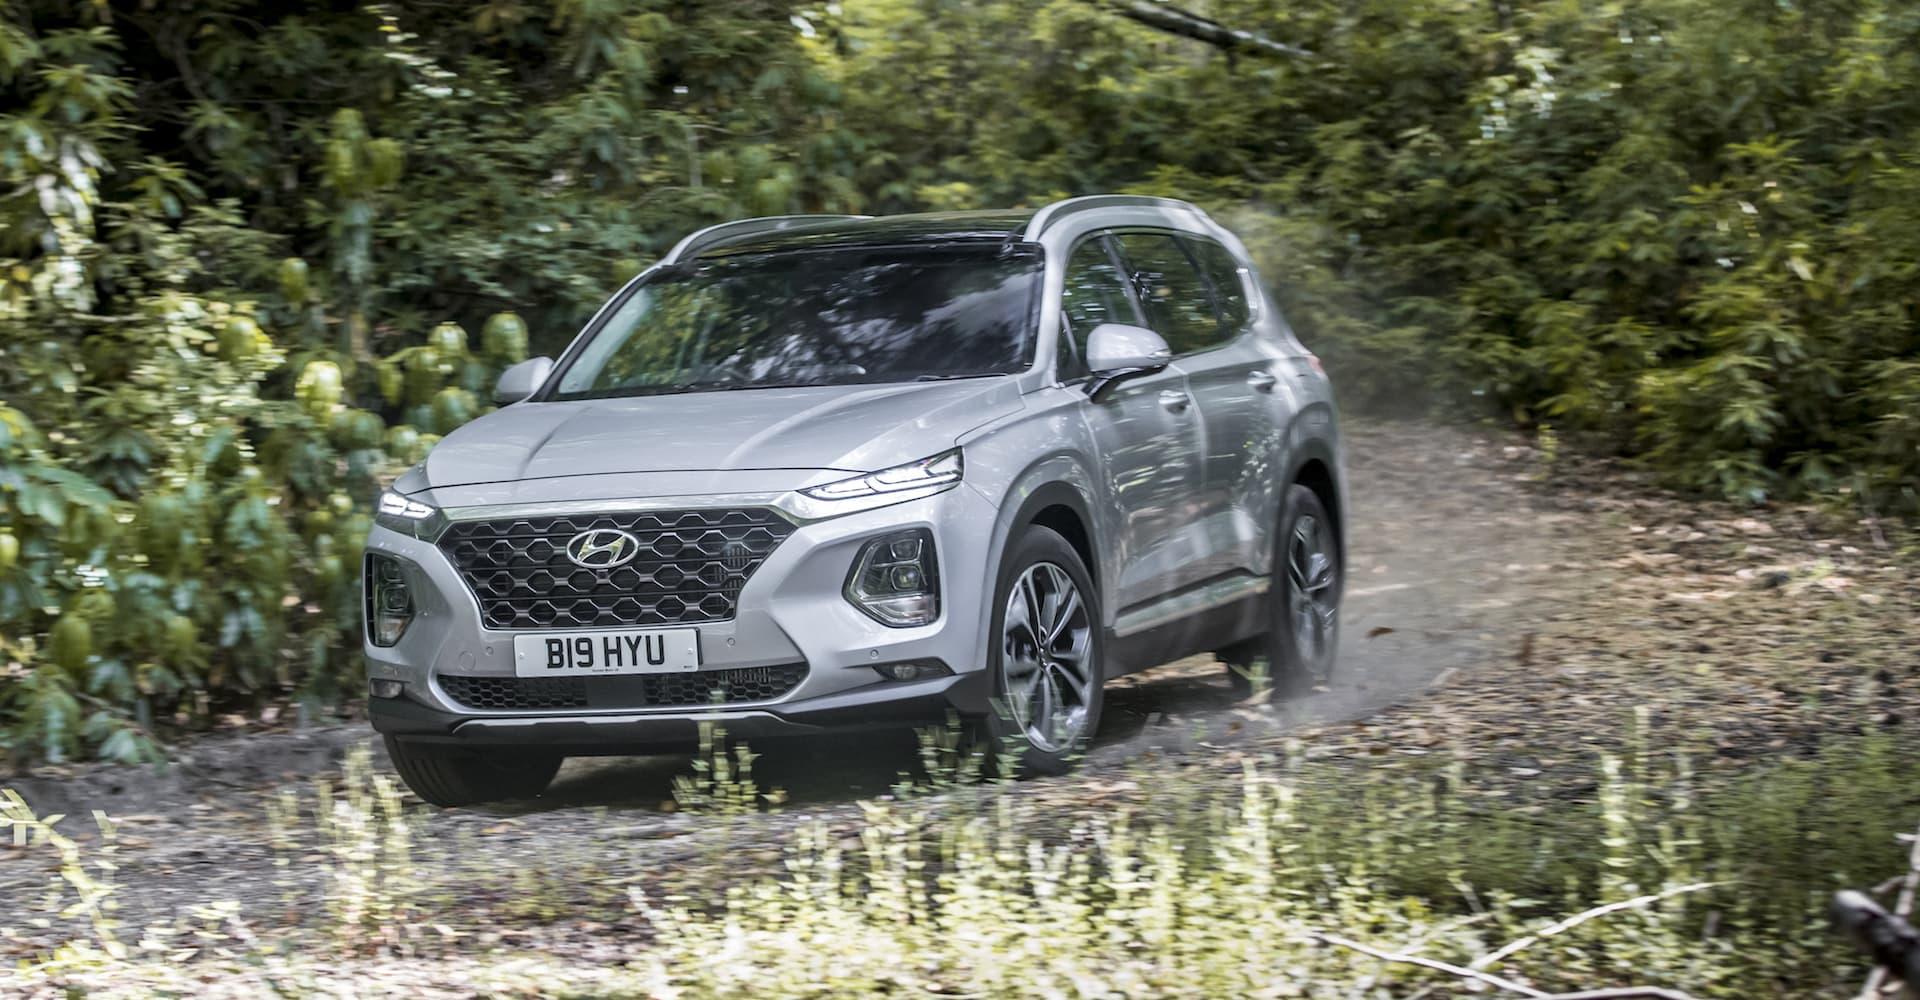 Hyundai Santa Fe (2018) new car ratings and reviews   The Car Expert